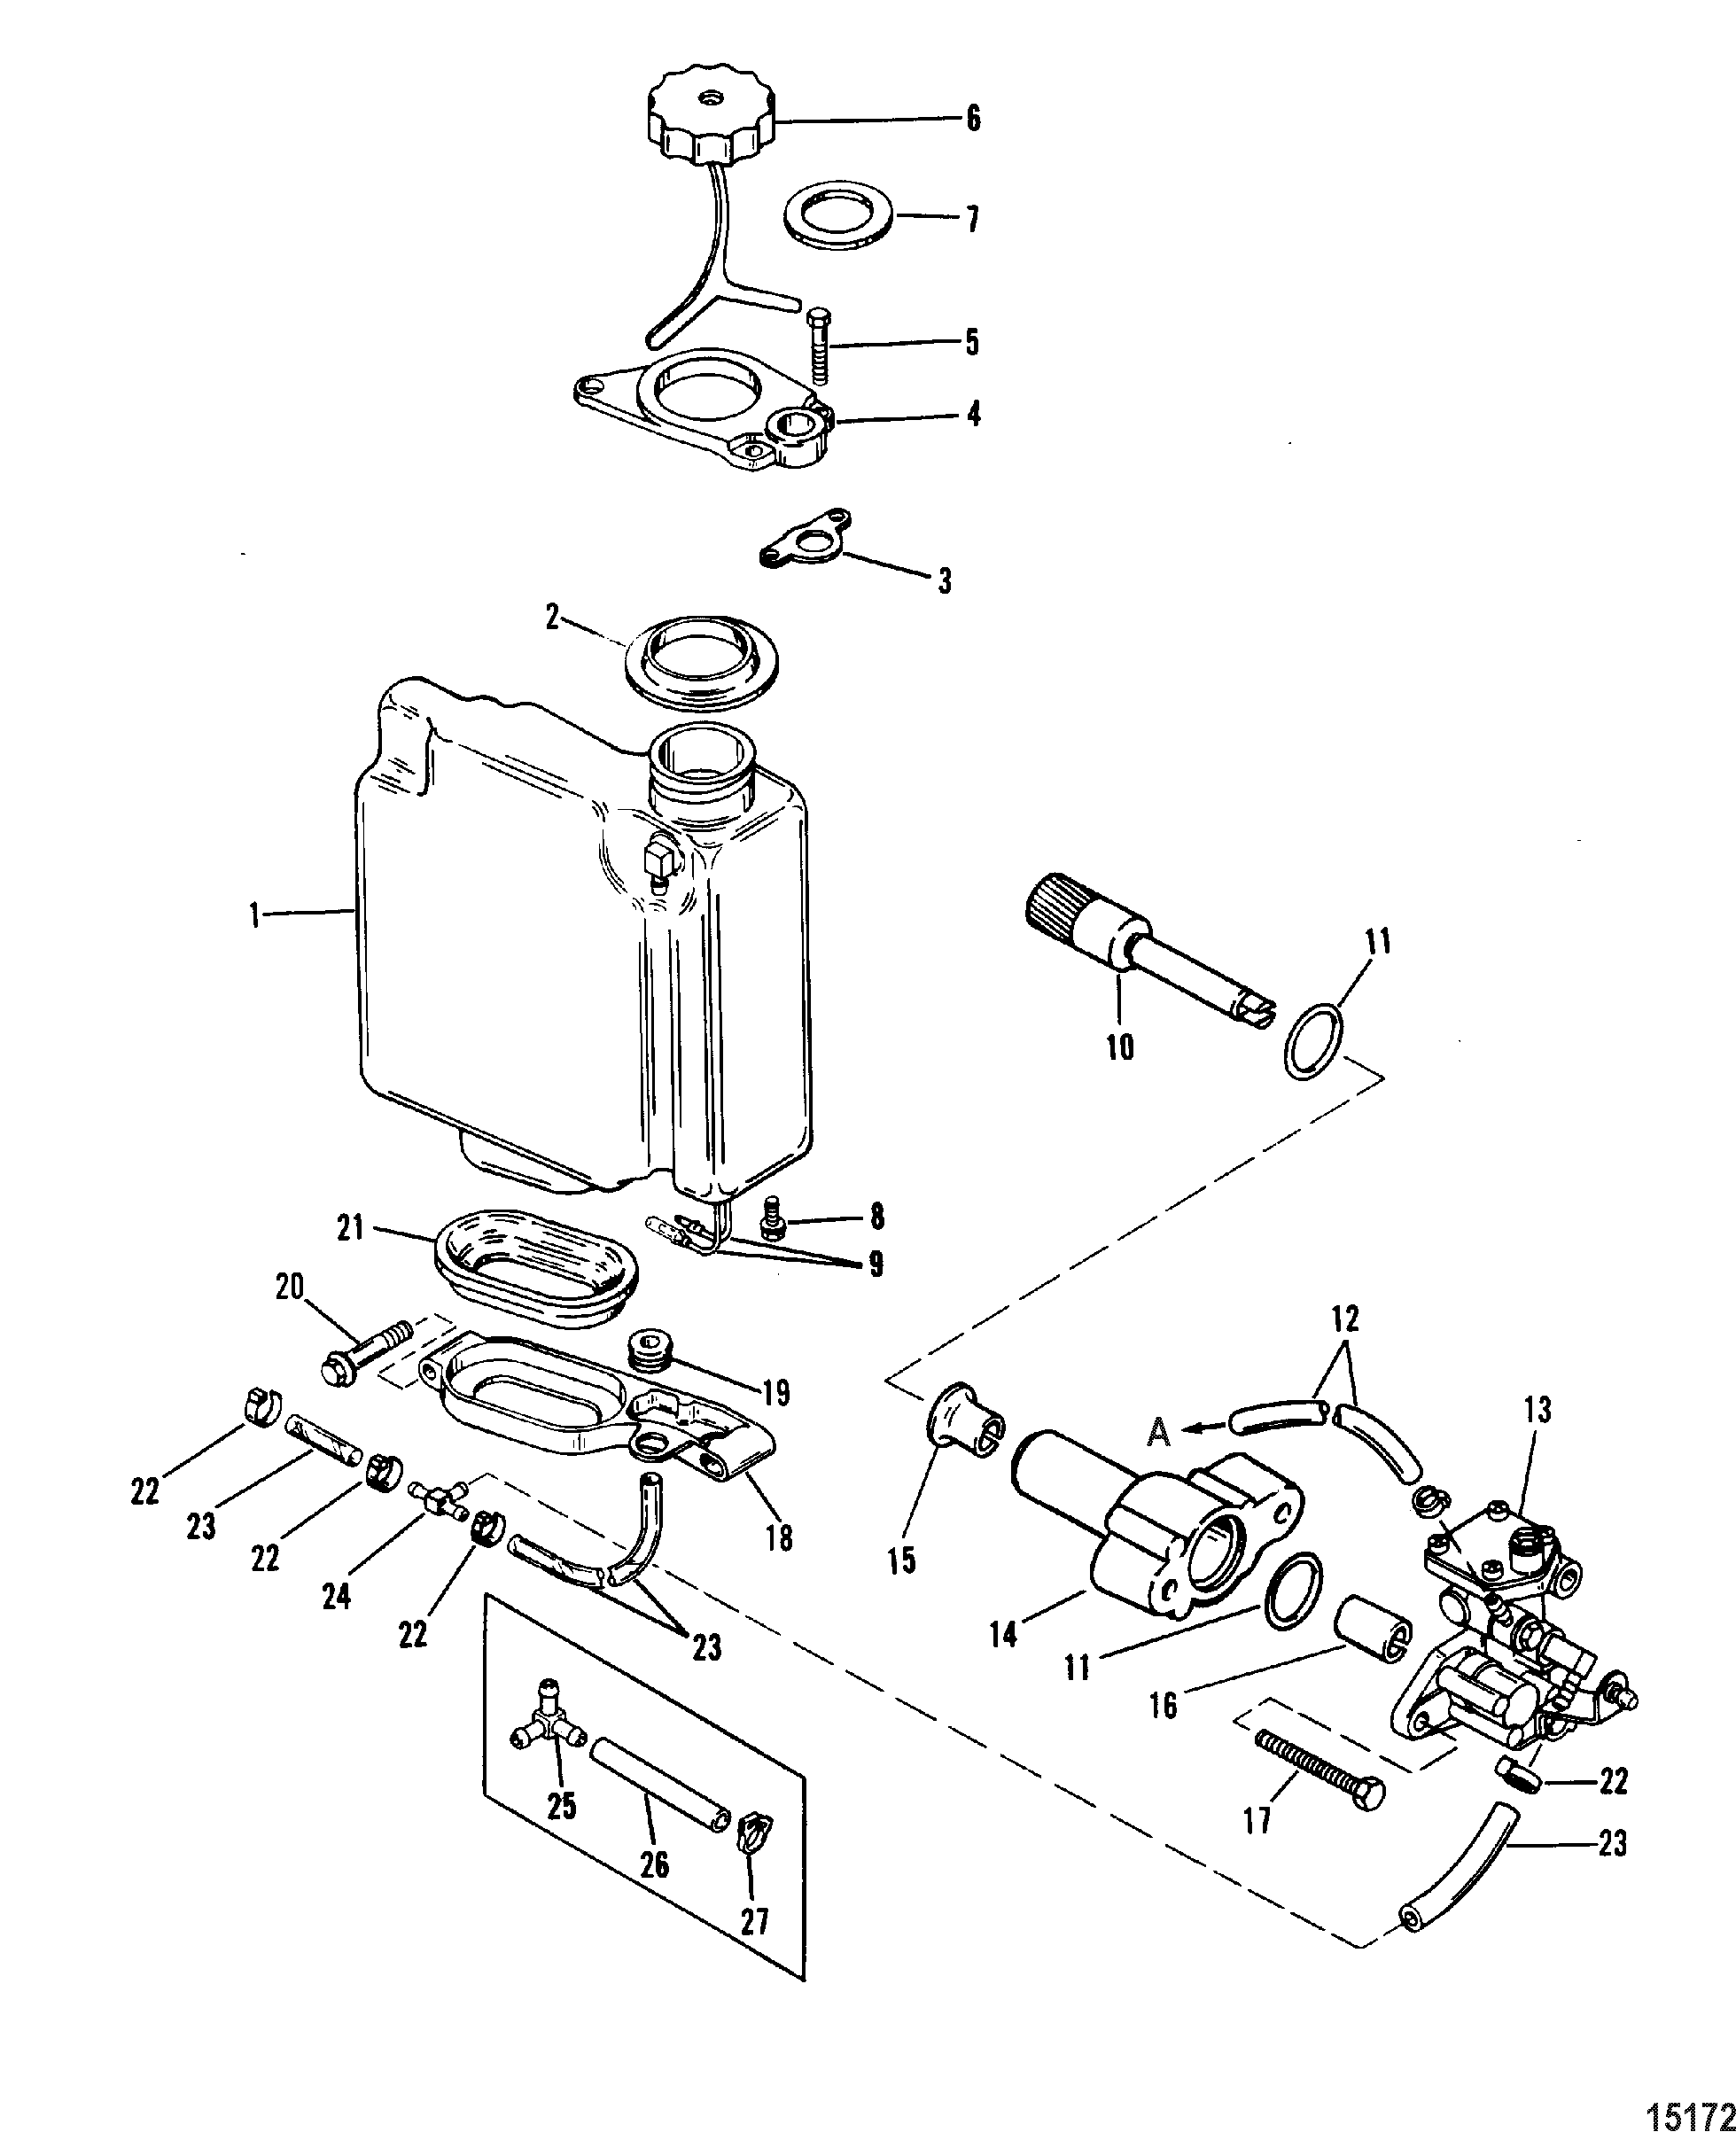 2000 johnson 115 wiring diagram